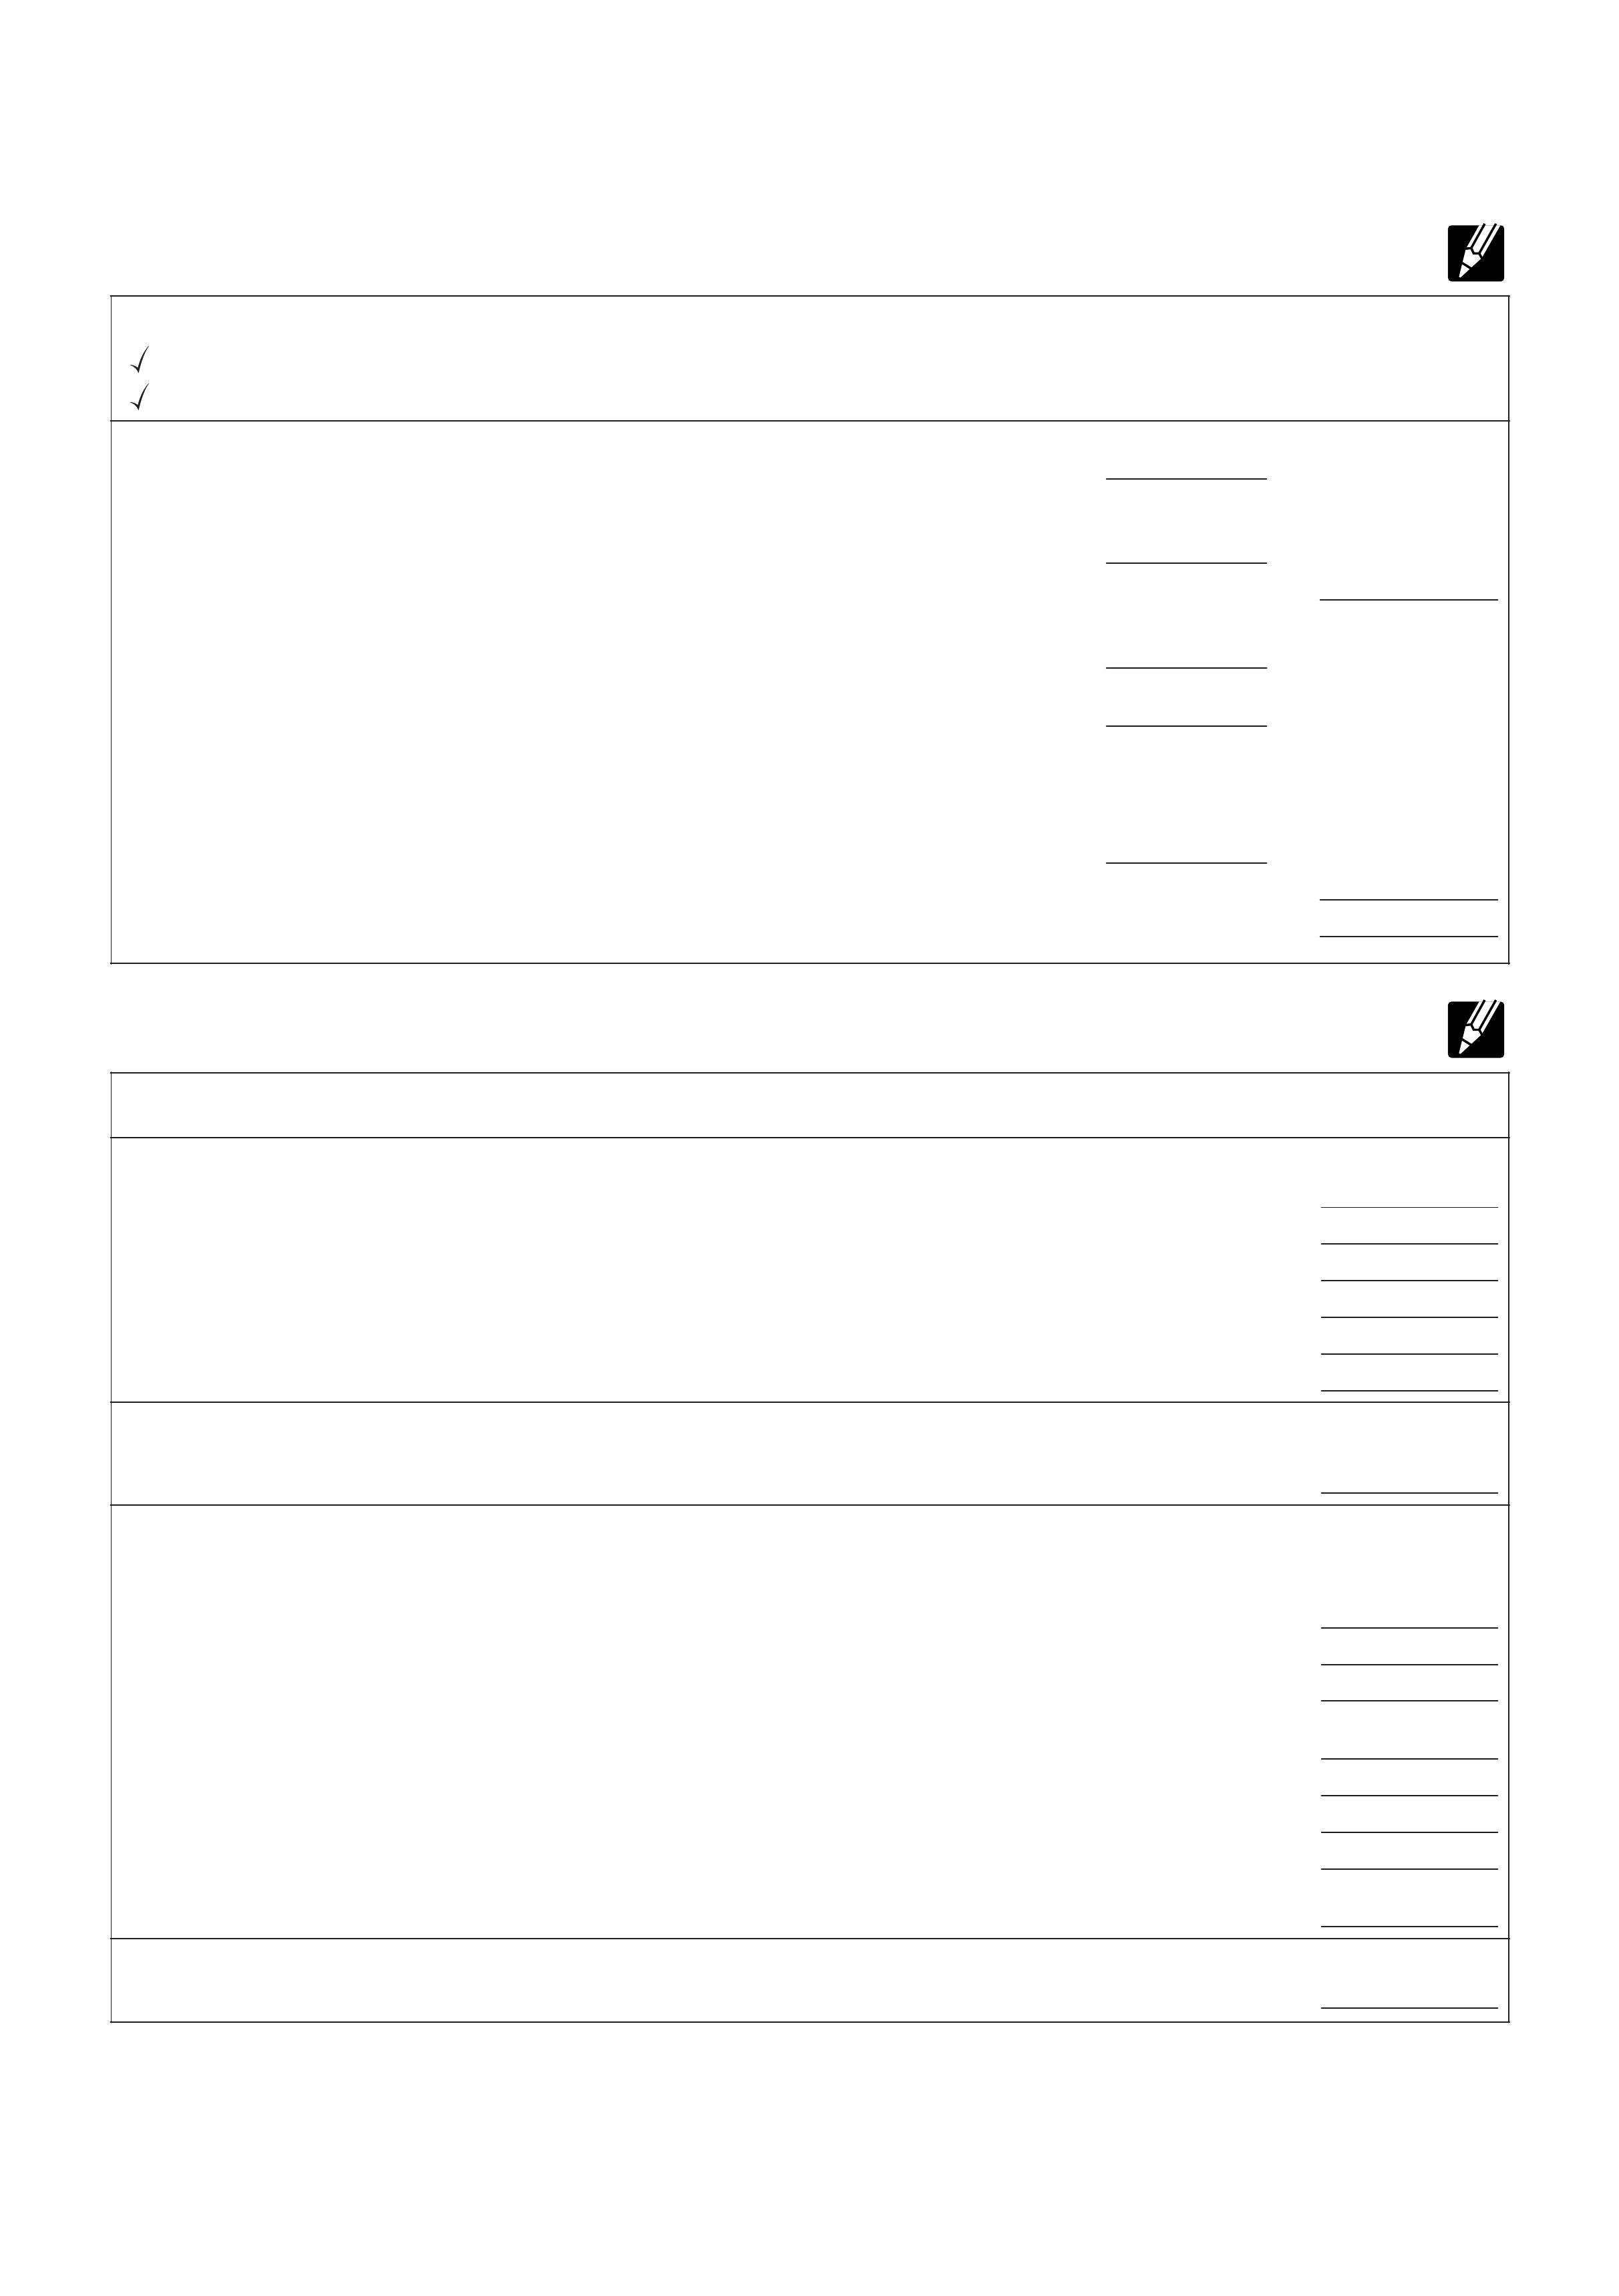 Child Tax Credit Form